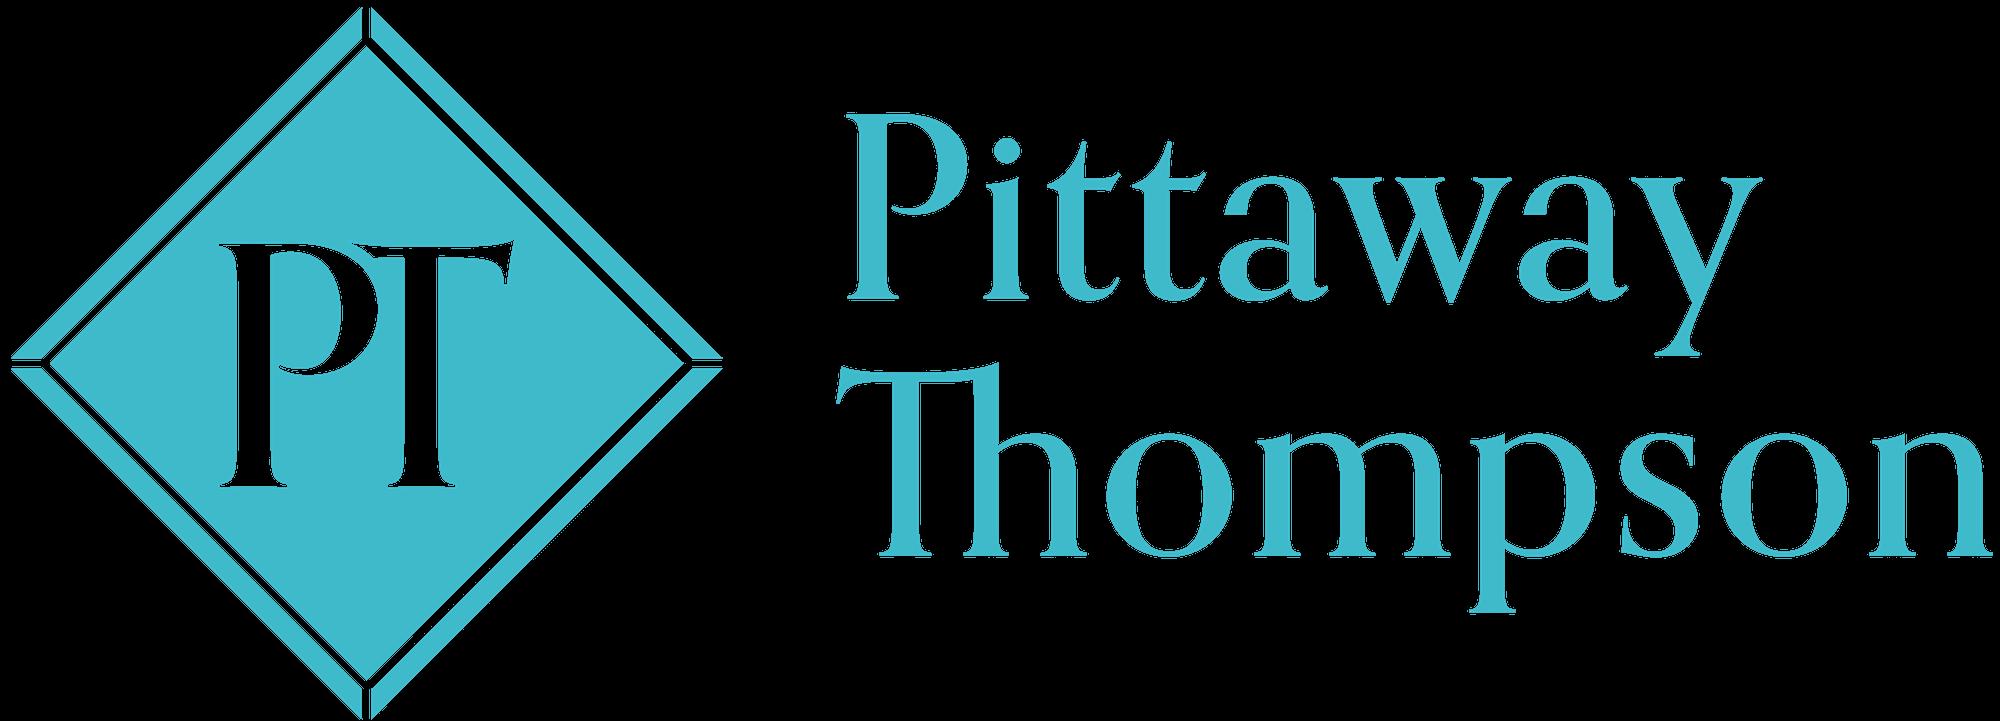 Pittaway Thompson